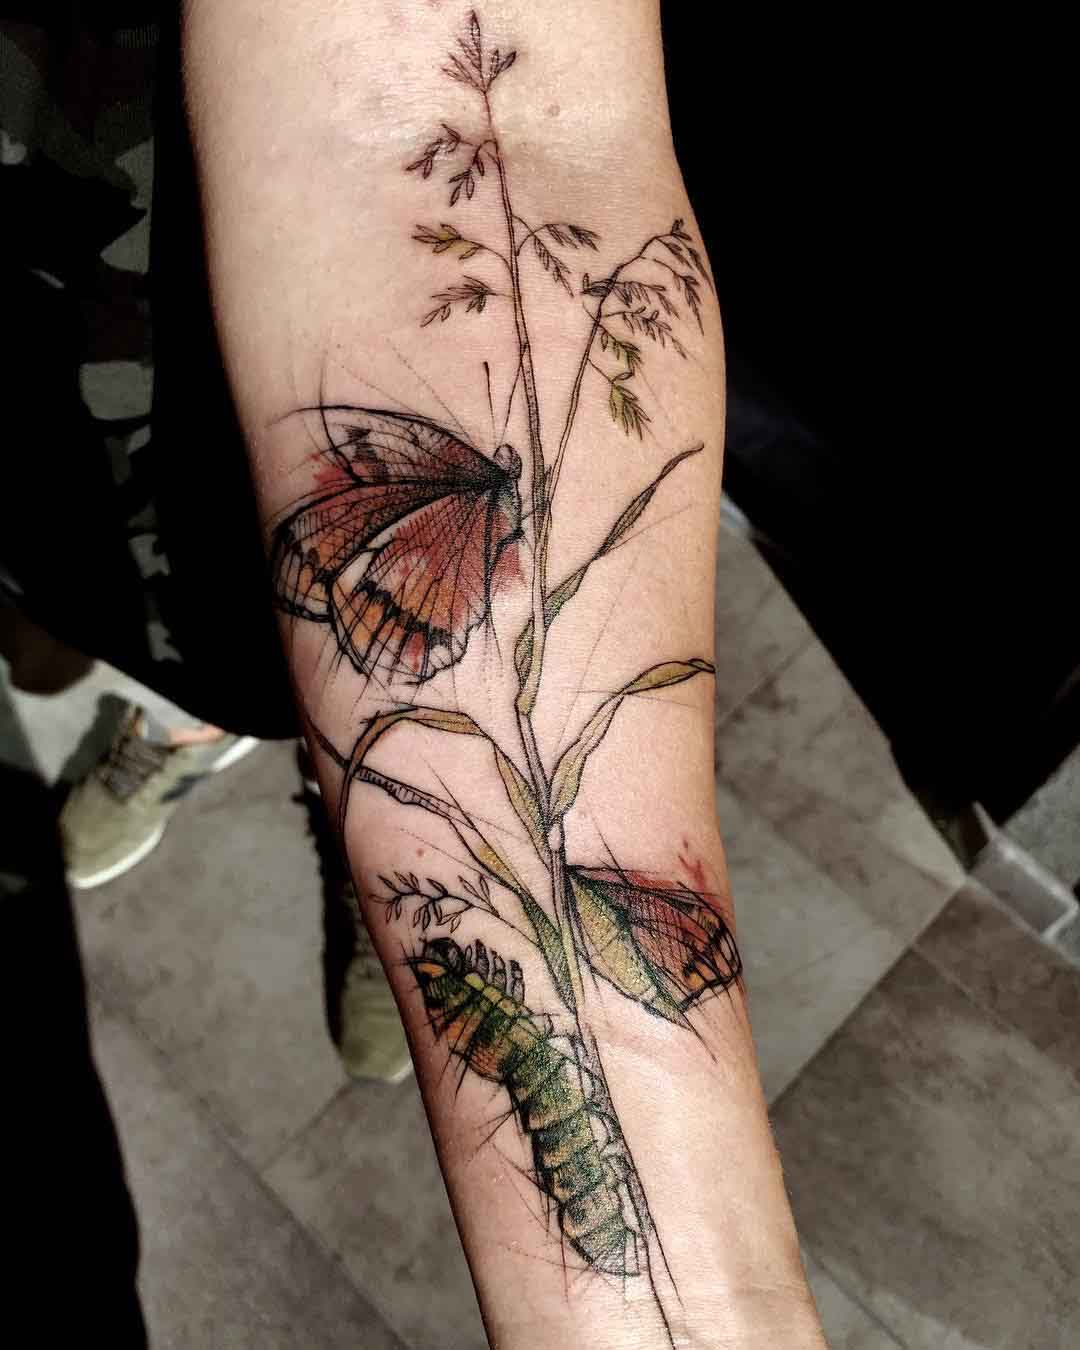 butterfly and catterpillar tattoo